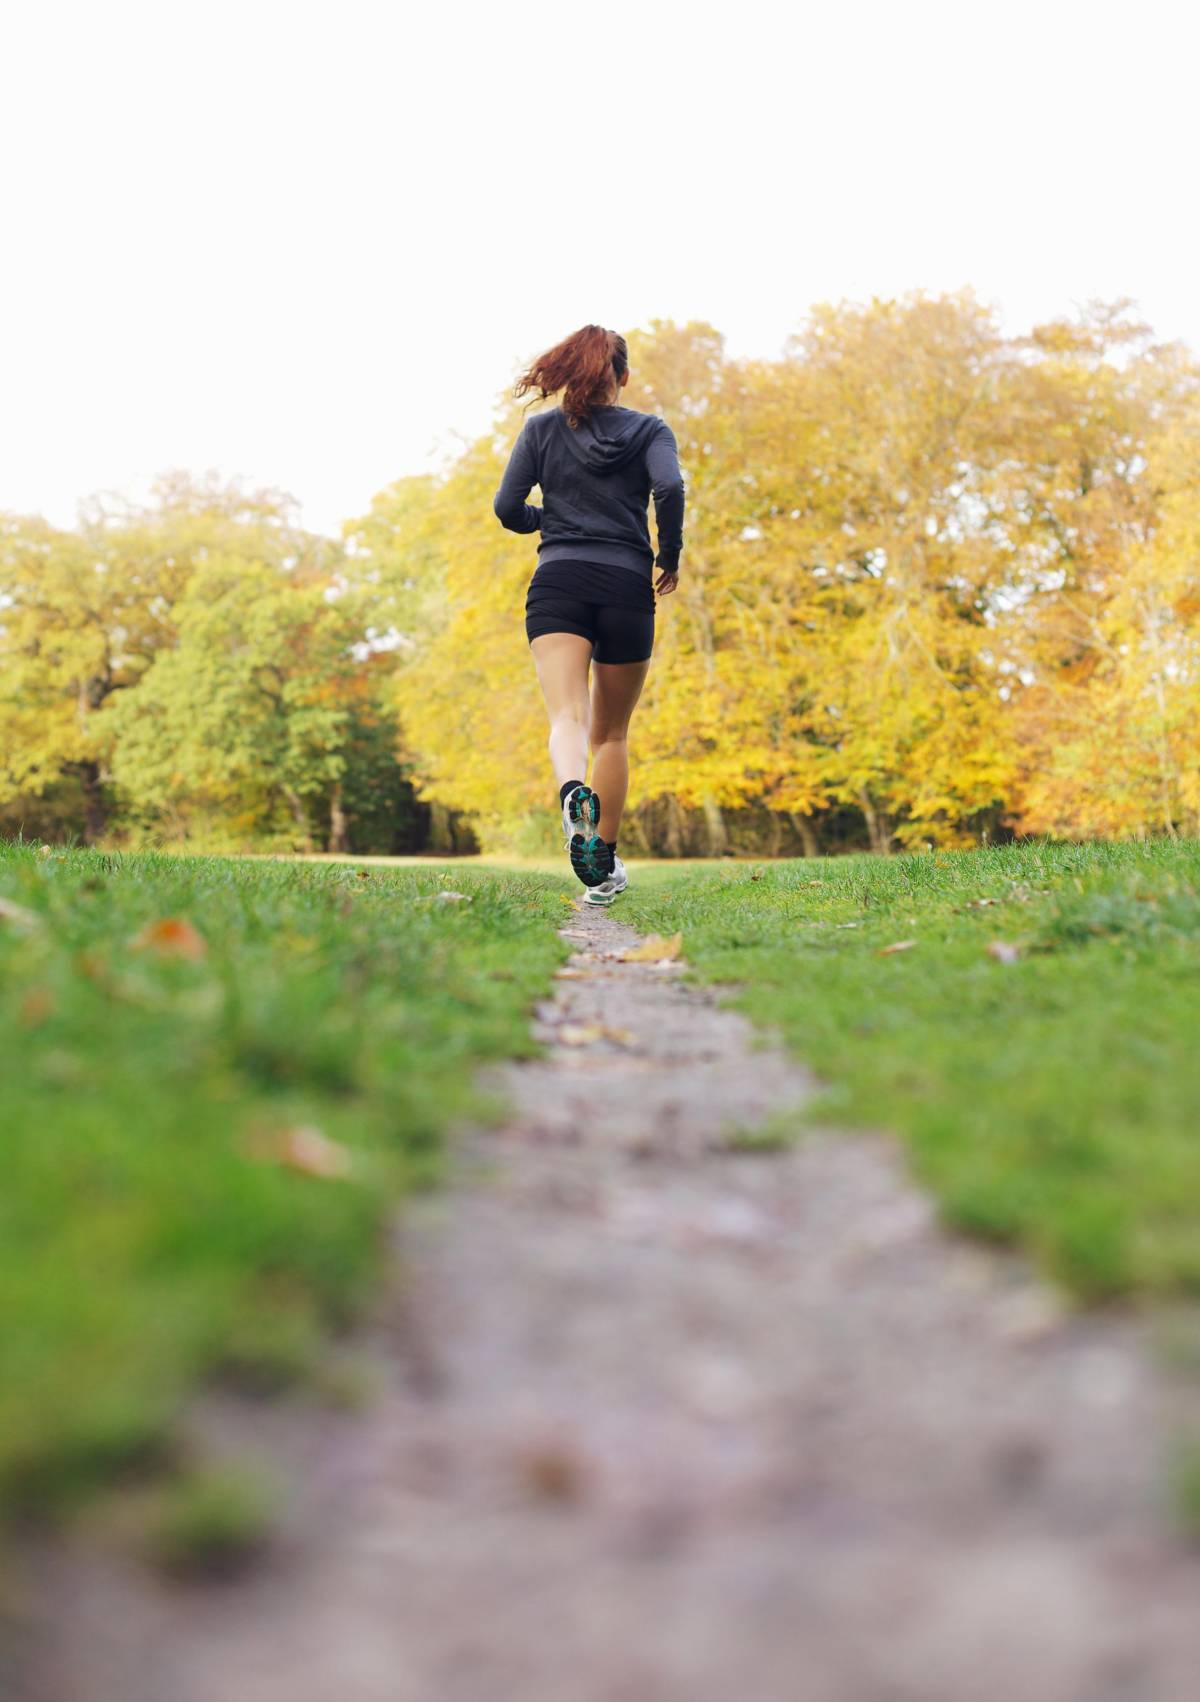 Running, una ricarica di energia per la mente